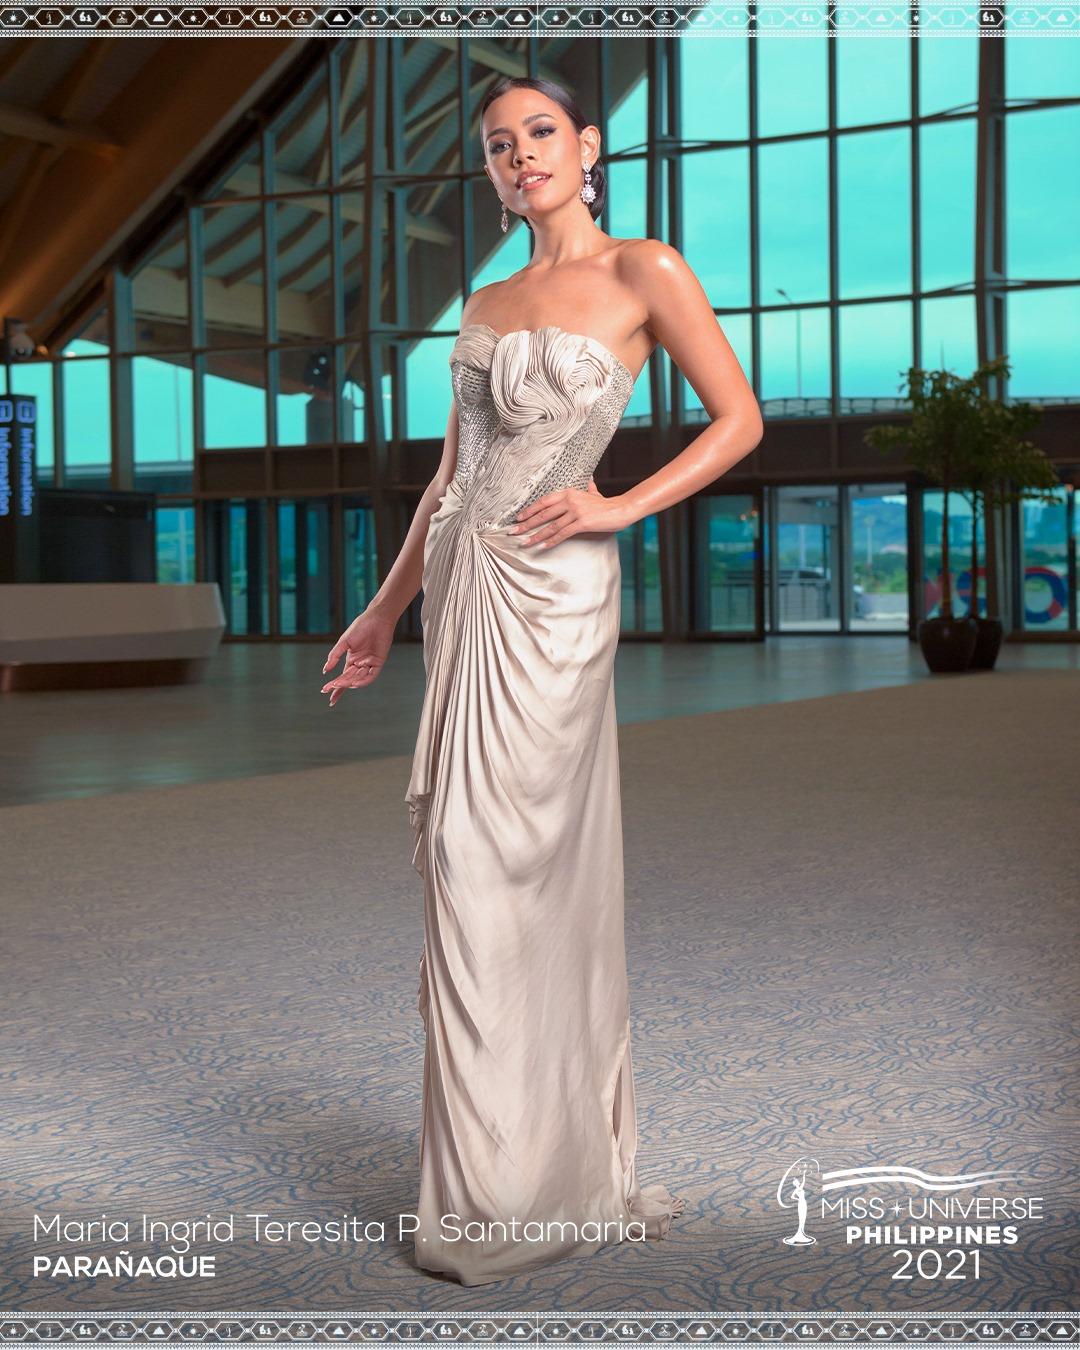 maria-ingrid-teresita-santamaria-evening-gown-photo